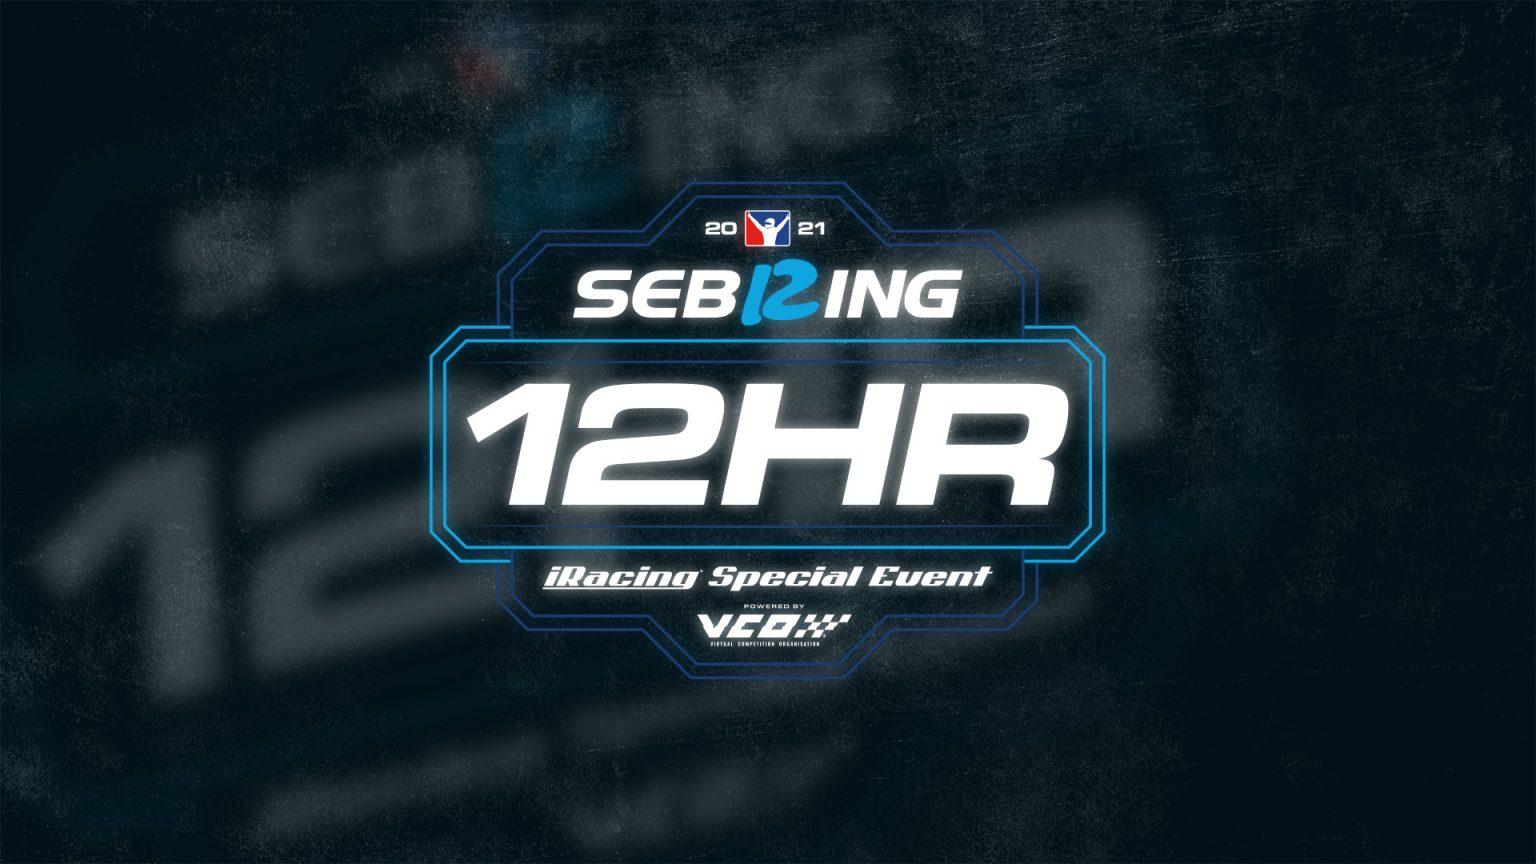 iRSE-Sebring-12HR-feature-1536x864.jpg